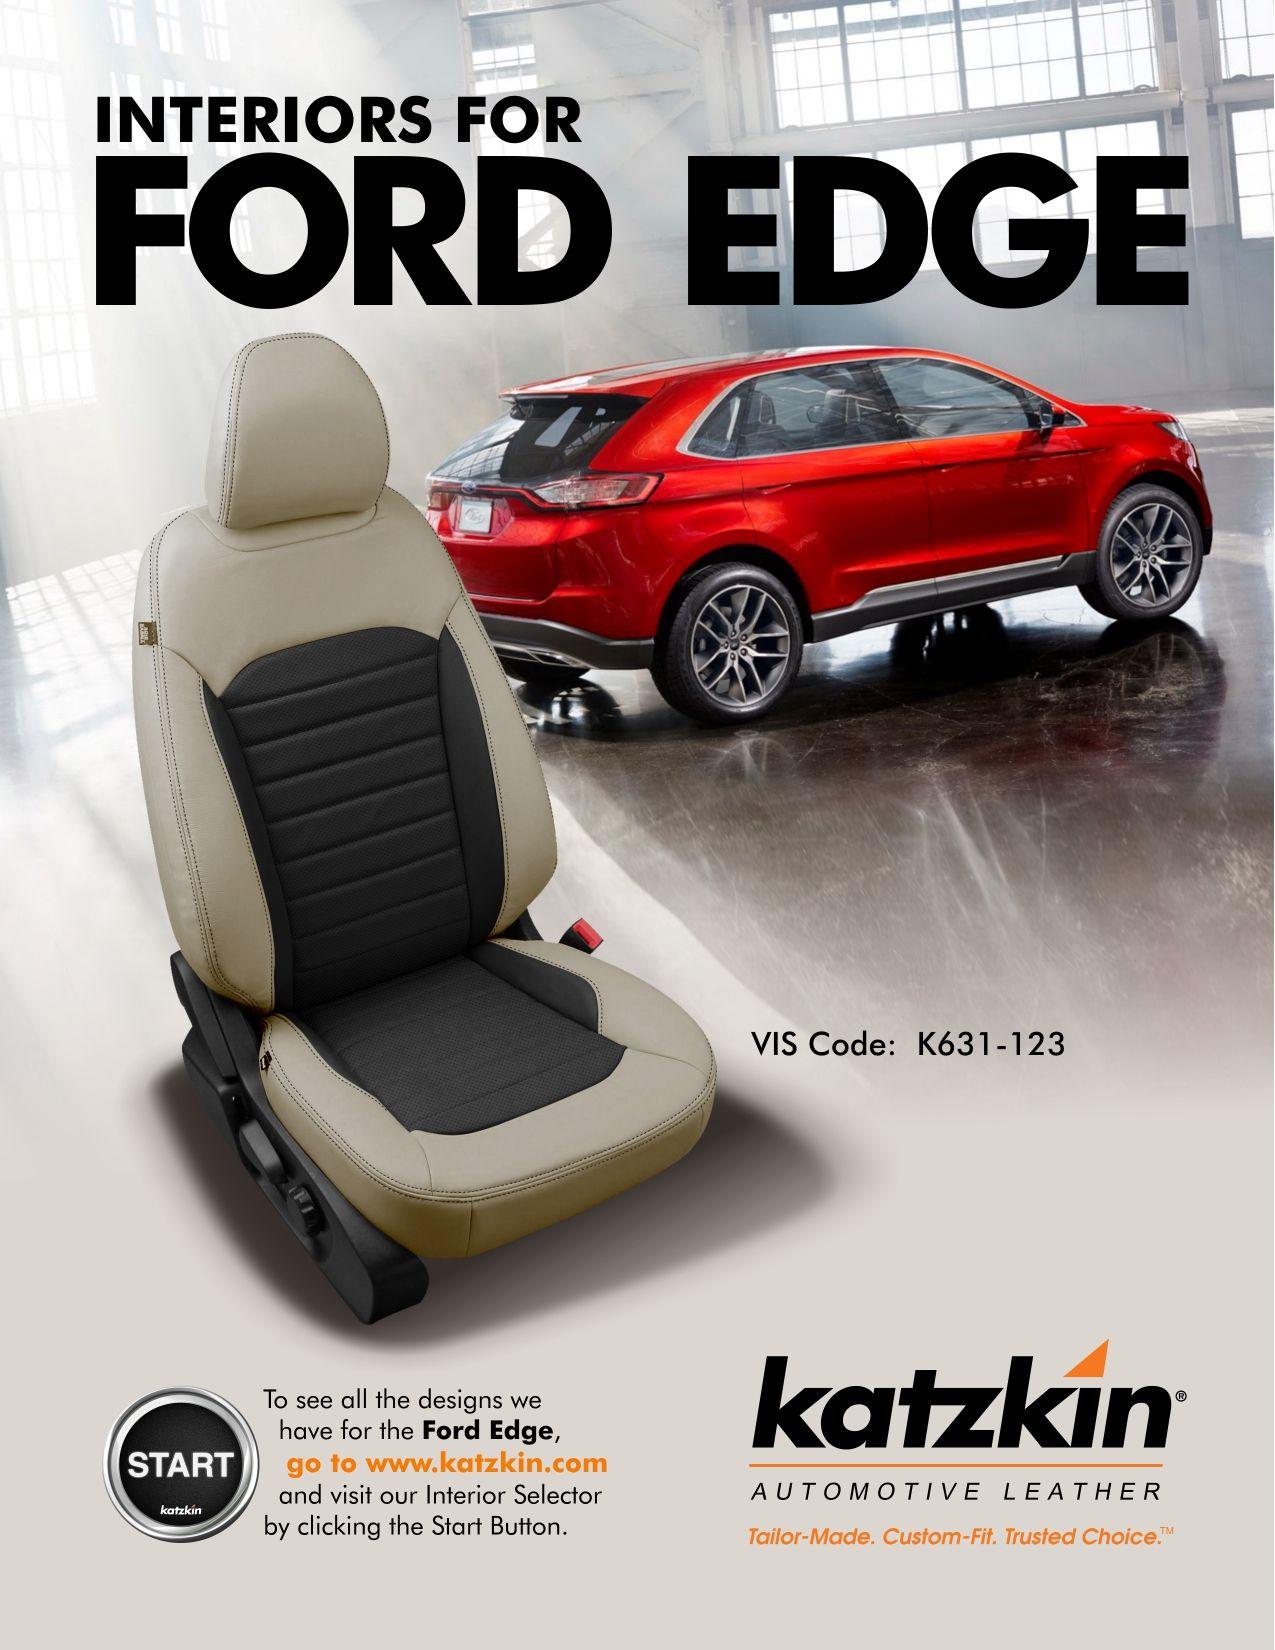 2015 Ford Edge (E-Brochure)